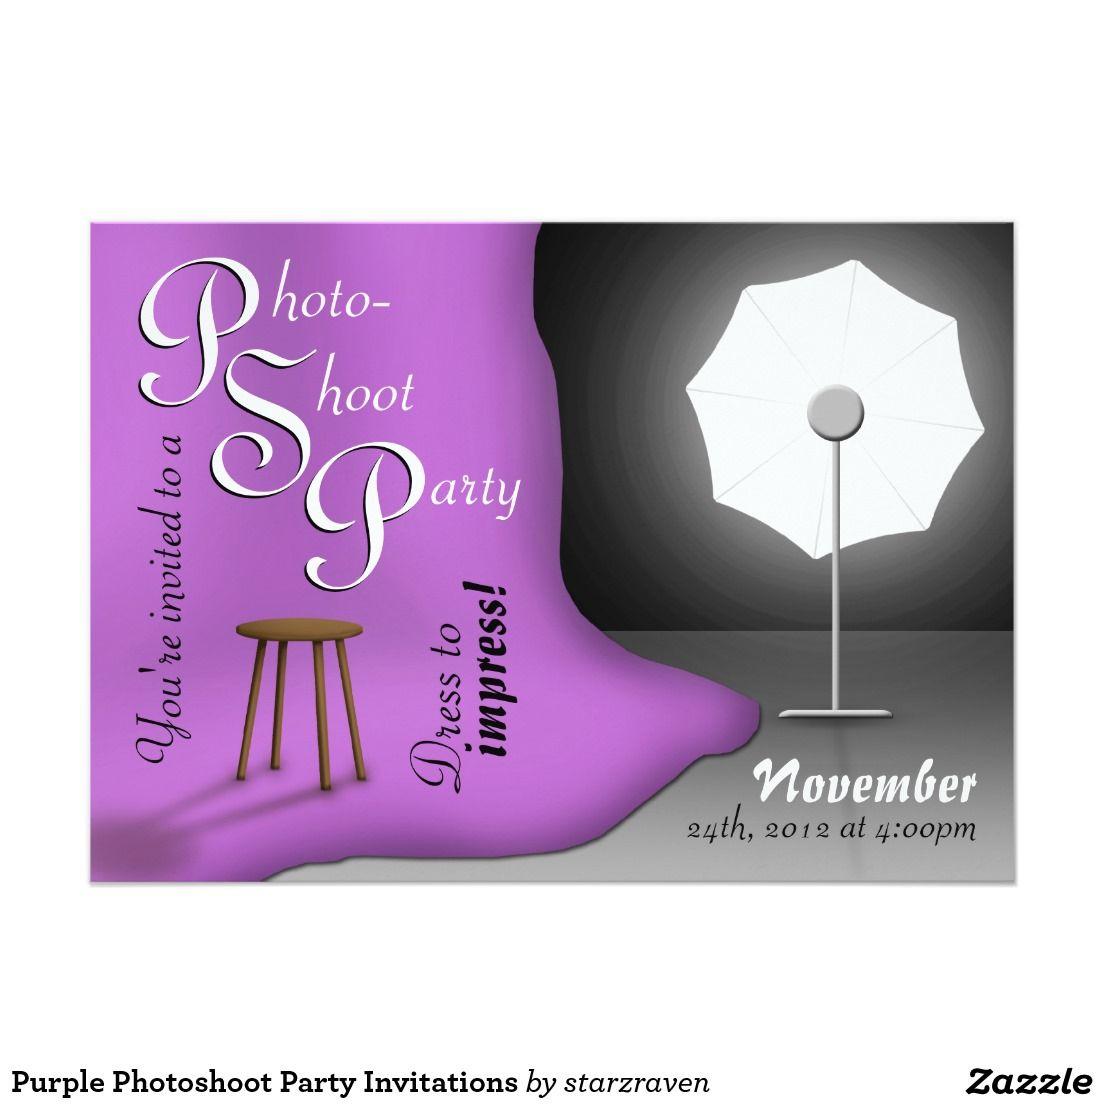 Purple Party Invitations The Best Invitation In 2017 – Purple Party Invitations